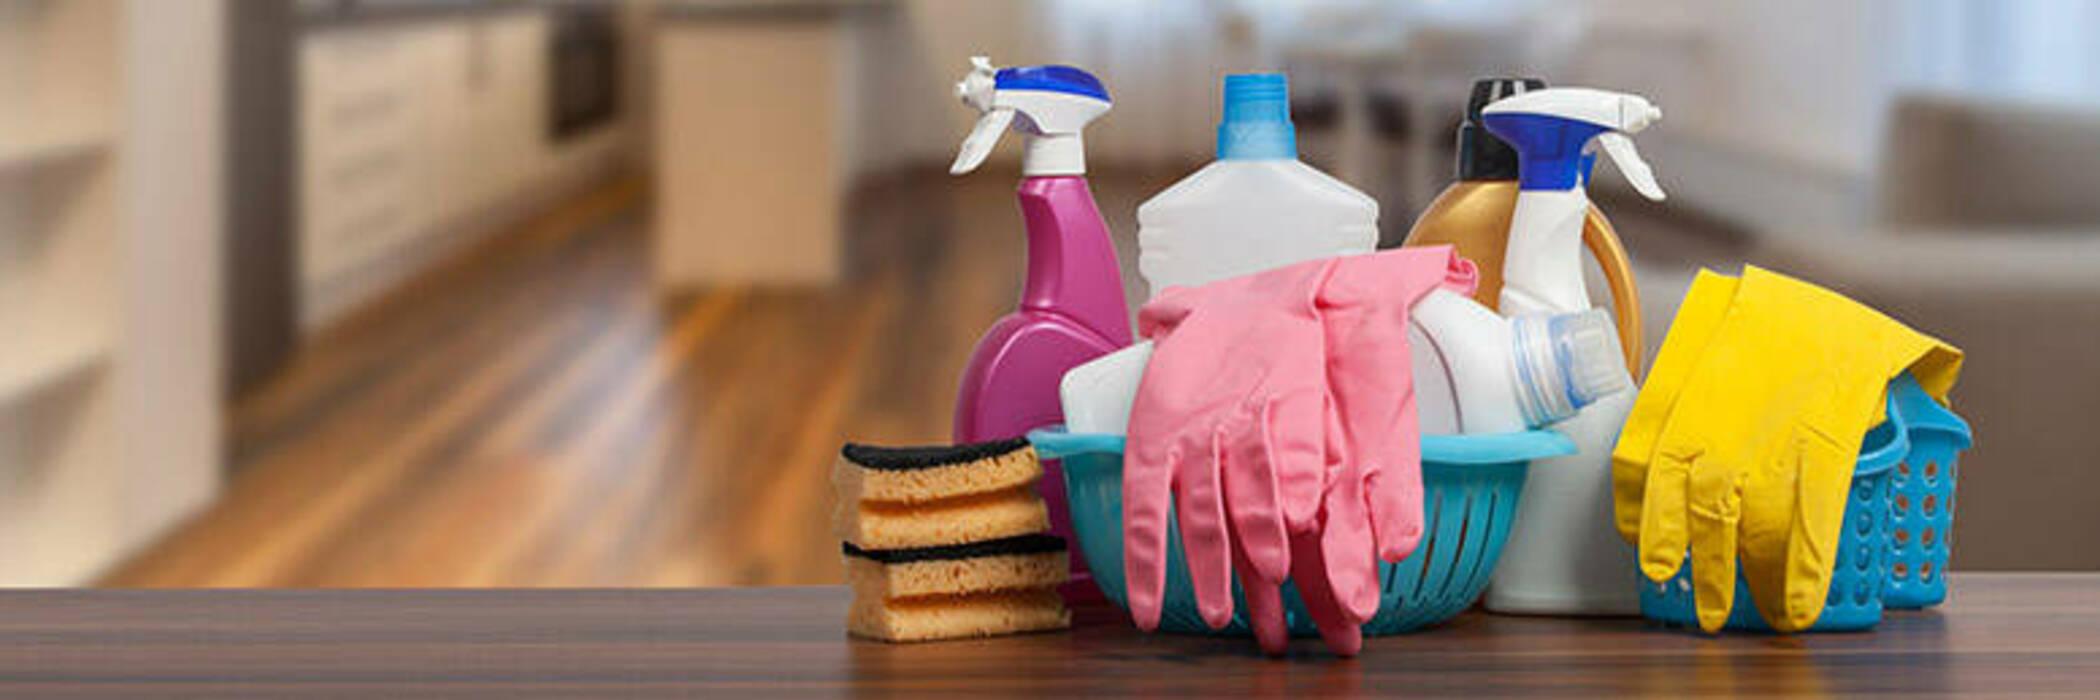 20jul household essentials clp hero